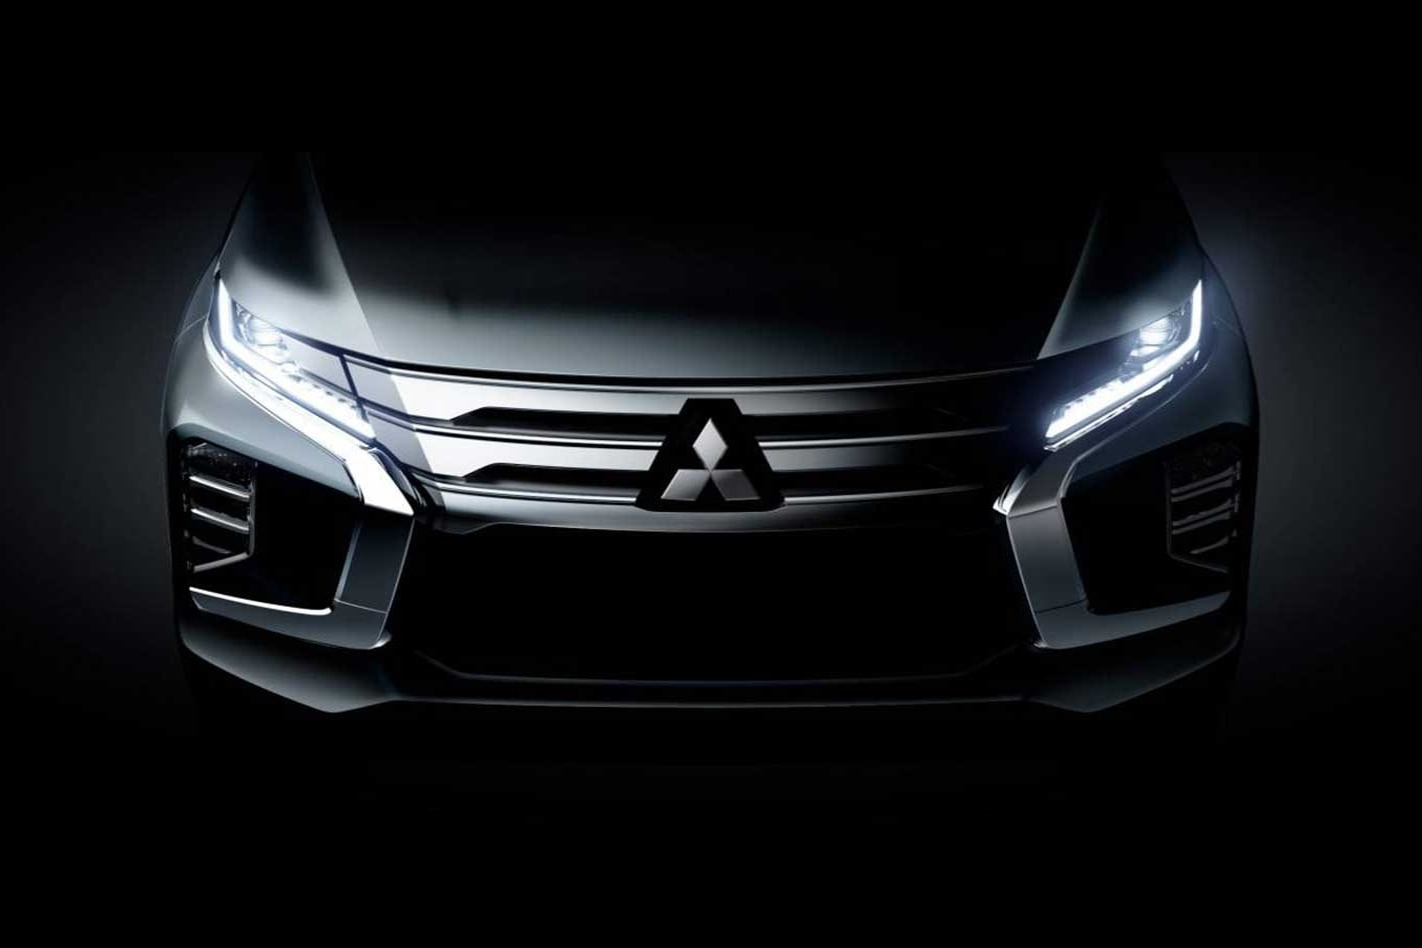 2020 Mitsubishi Pajero Sport teased debut